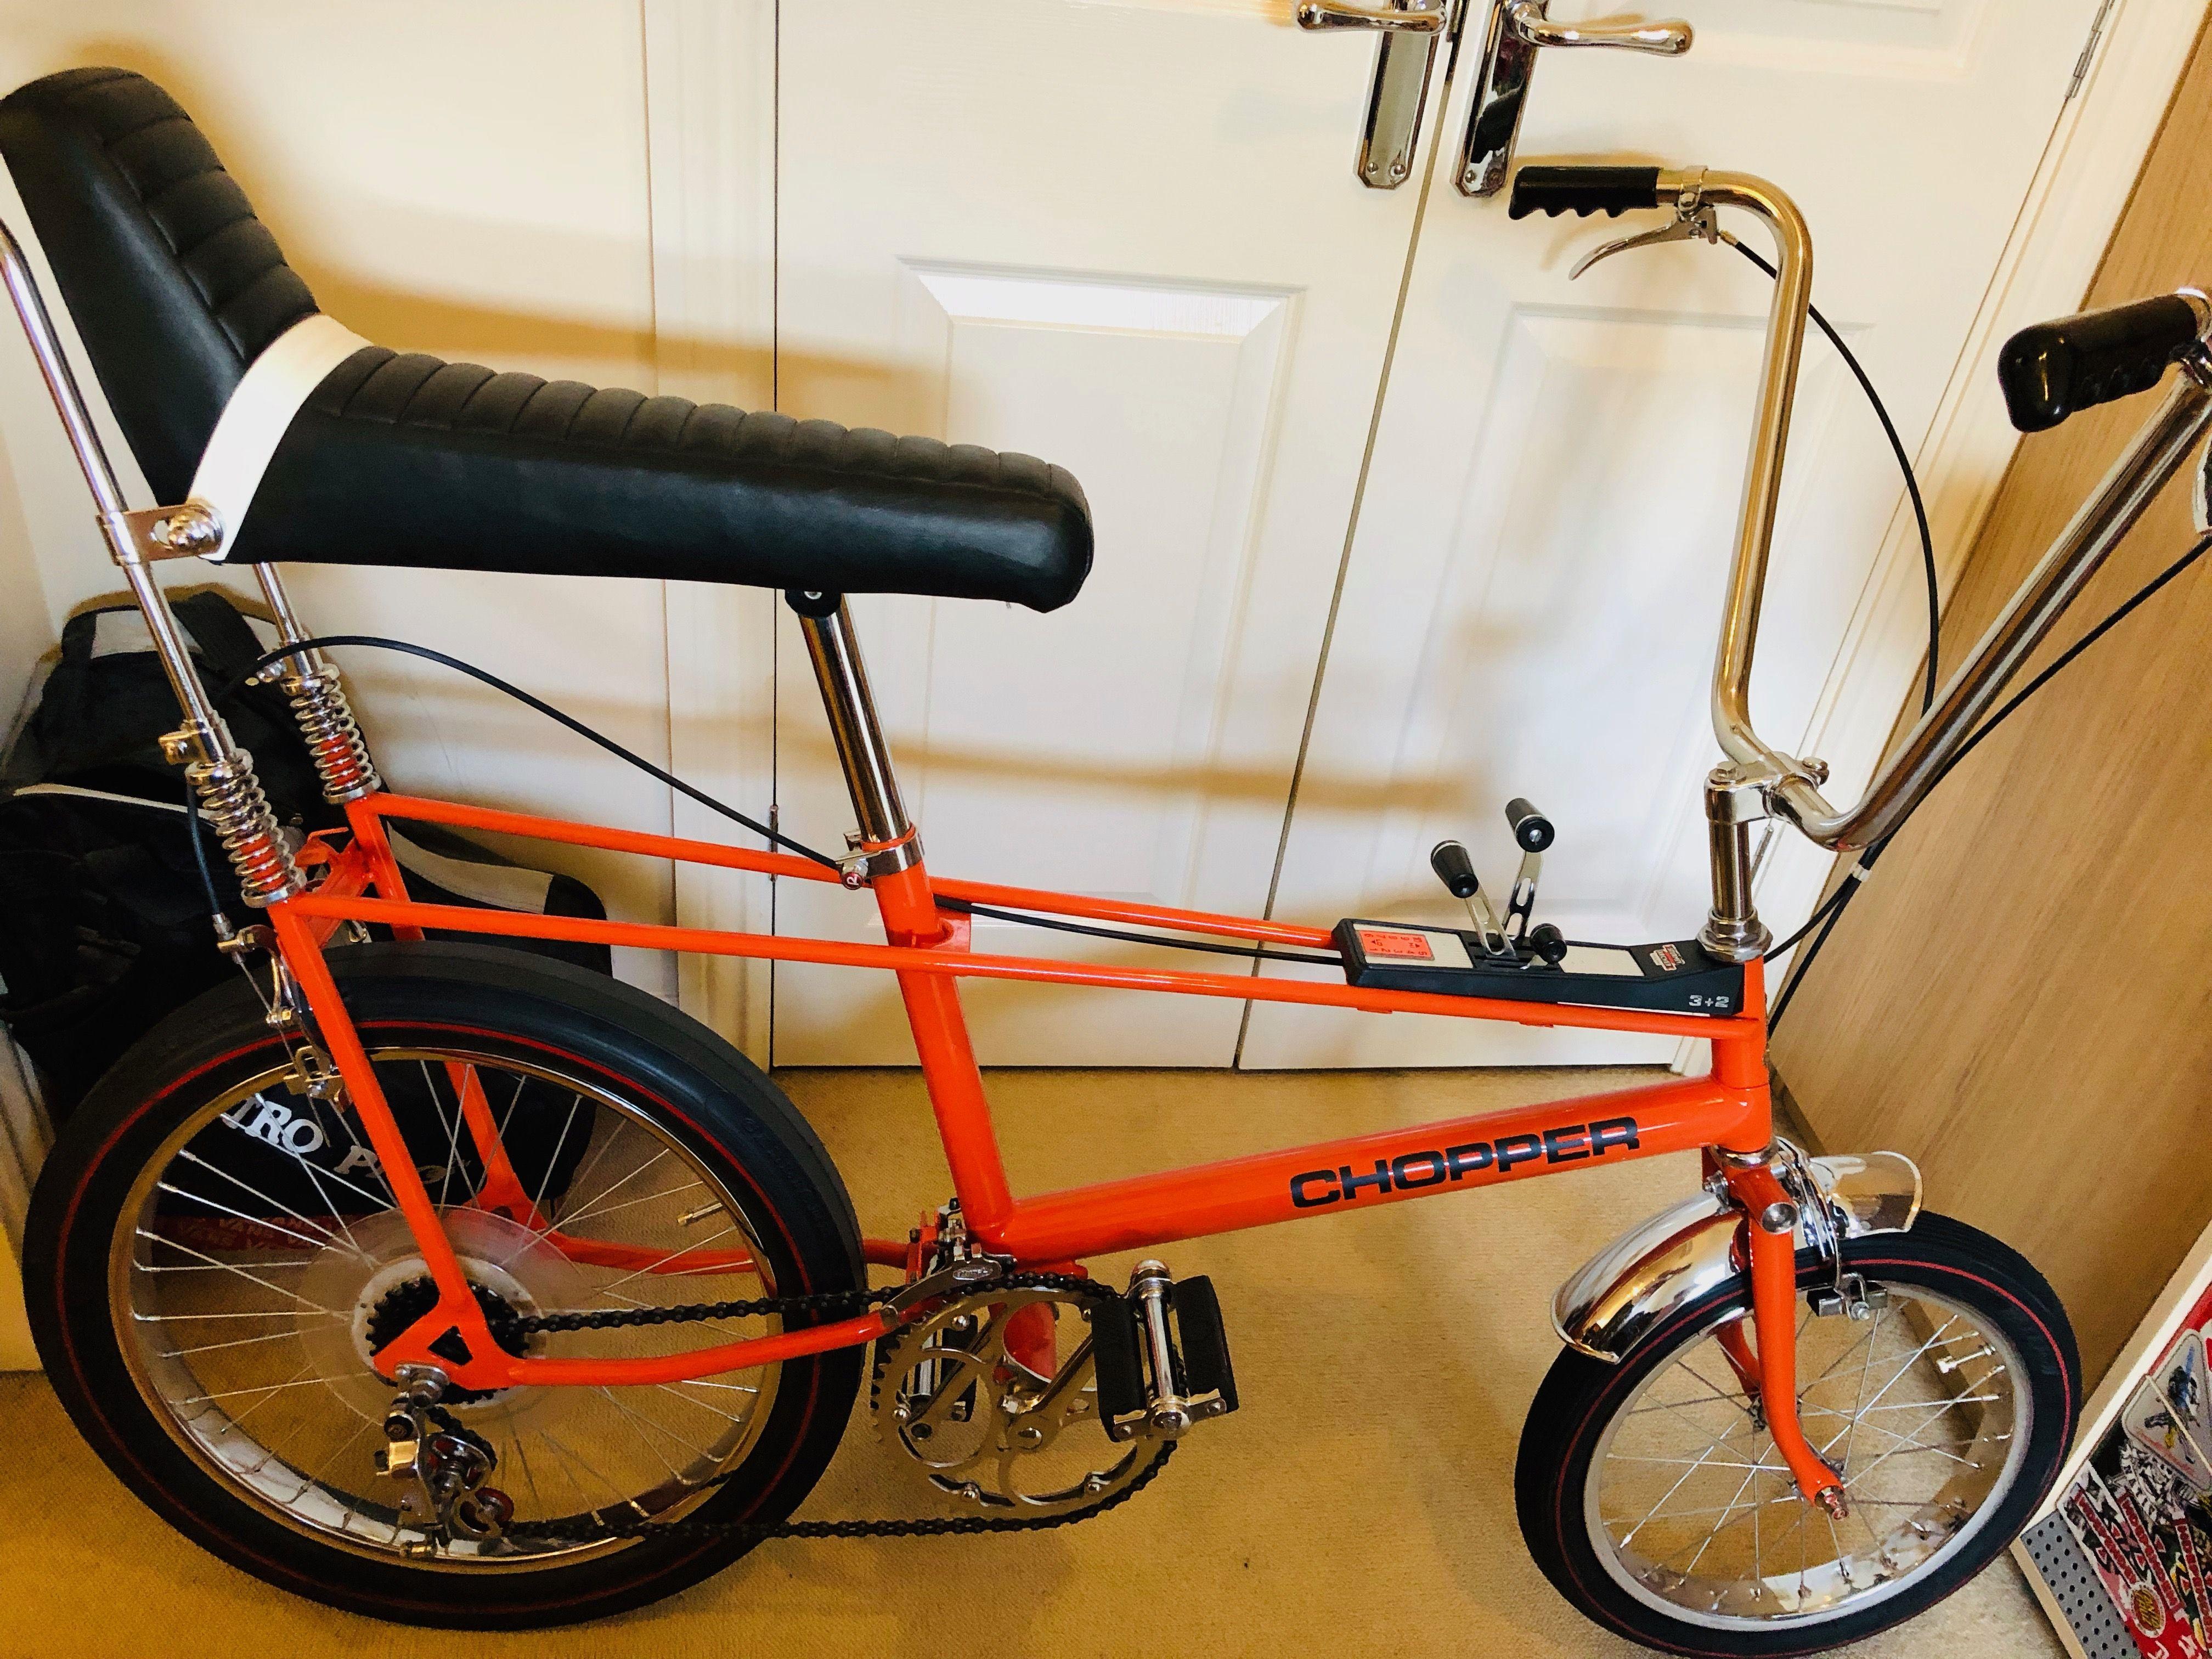 Raleigh Chopper Mk1 Ten speed | uni | Raleigh chopper, Bicycle, Bike